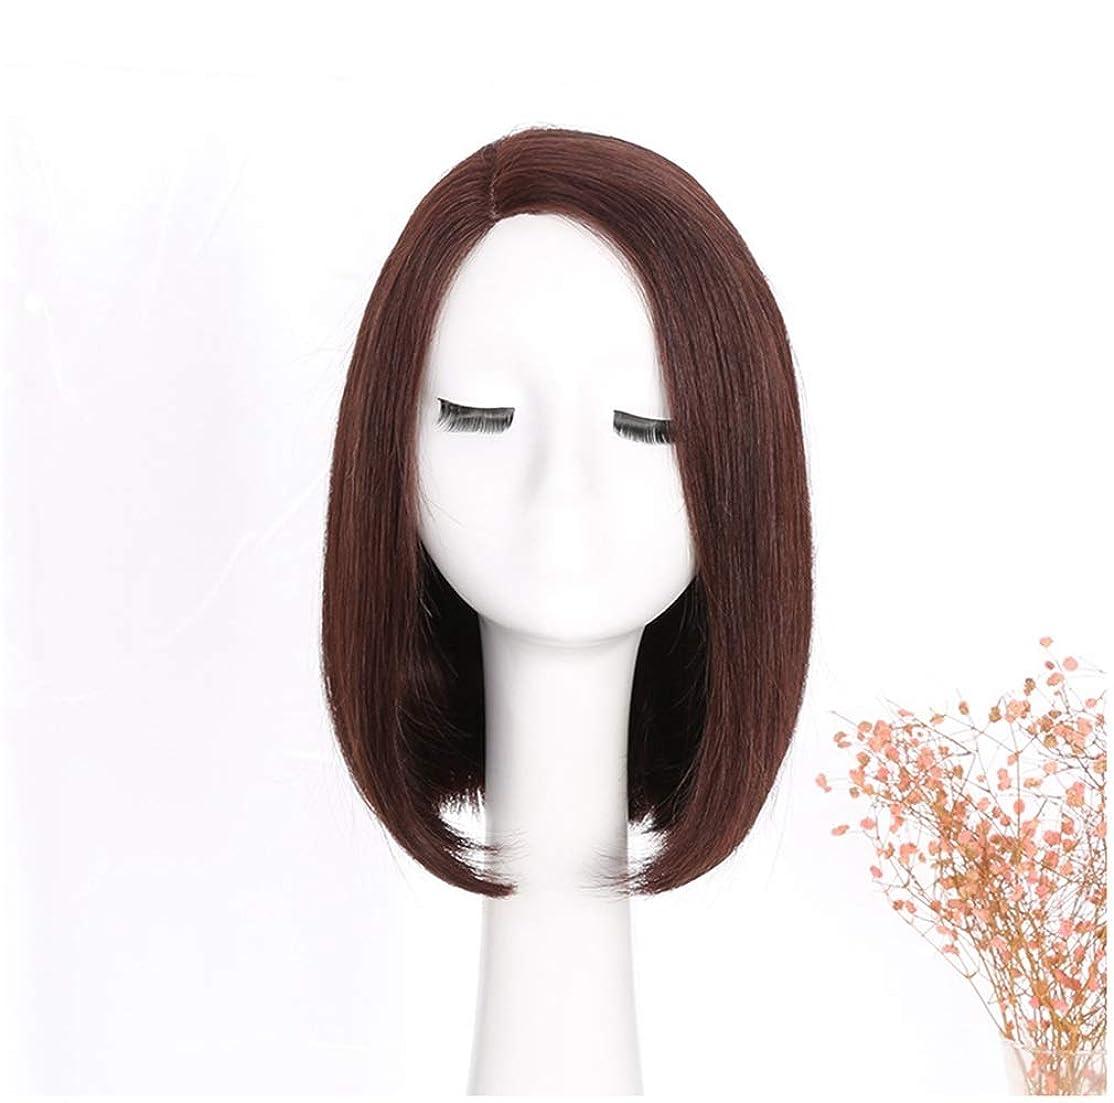 YOUQIU 女子ショートヘアボブ梨ヘッド実ヘアウィッグショルダーストレートヘアーのリアルなウィッグウィッグ (色 : Dark brown)